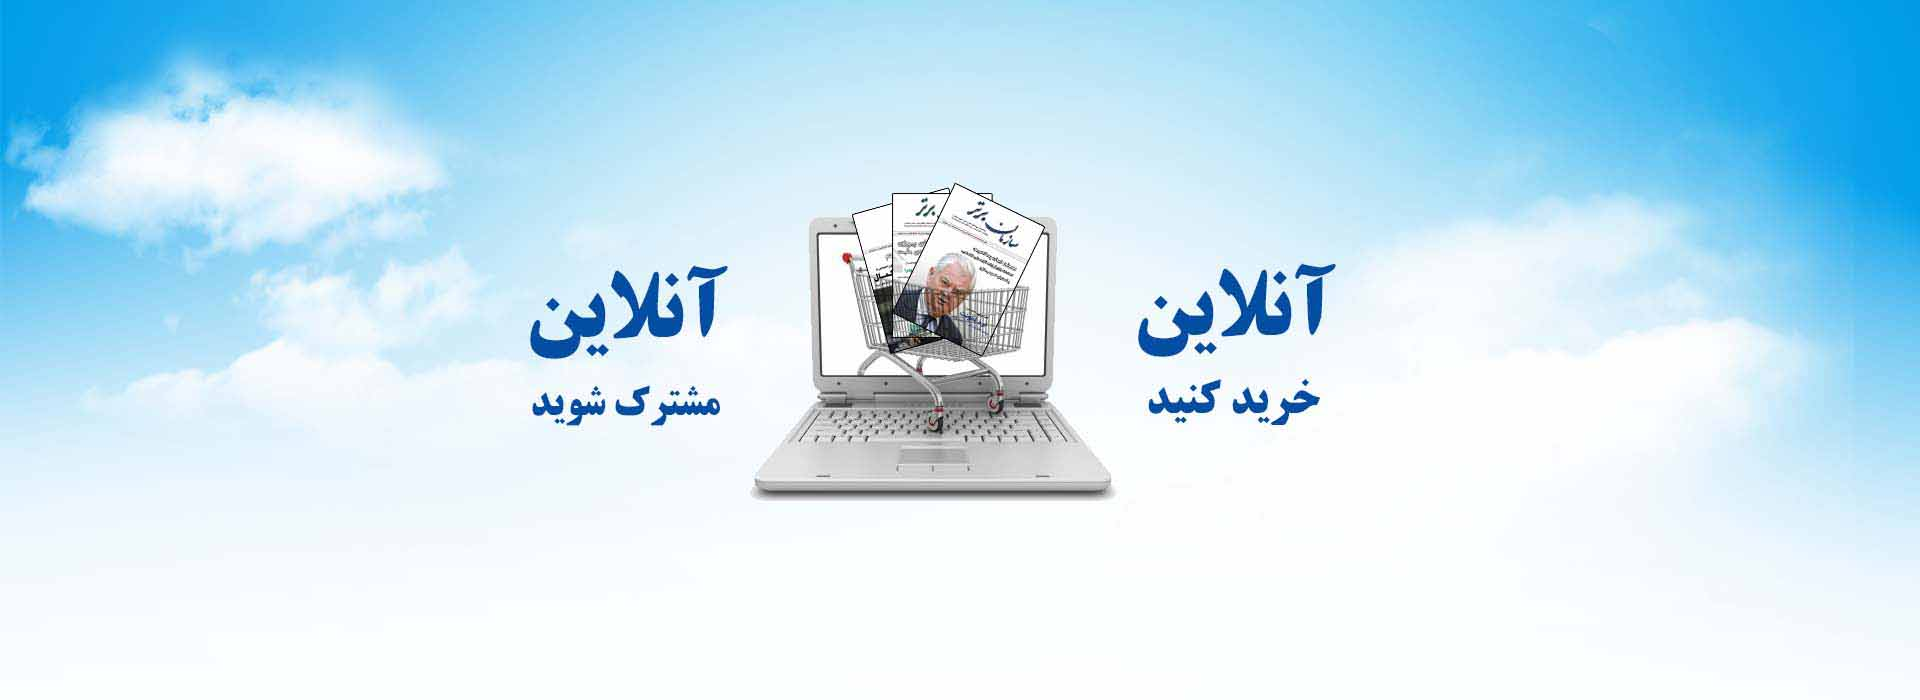 title_59ed3af8b82f97391255251508719352